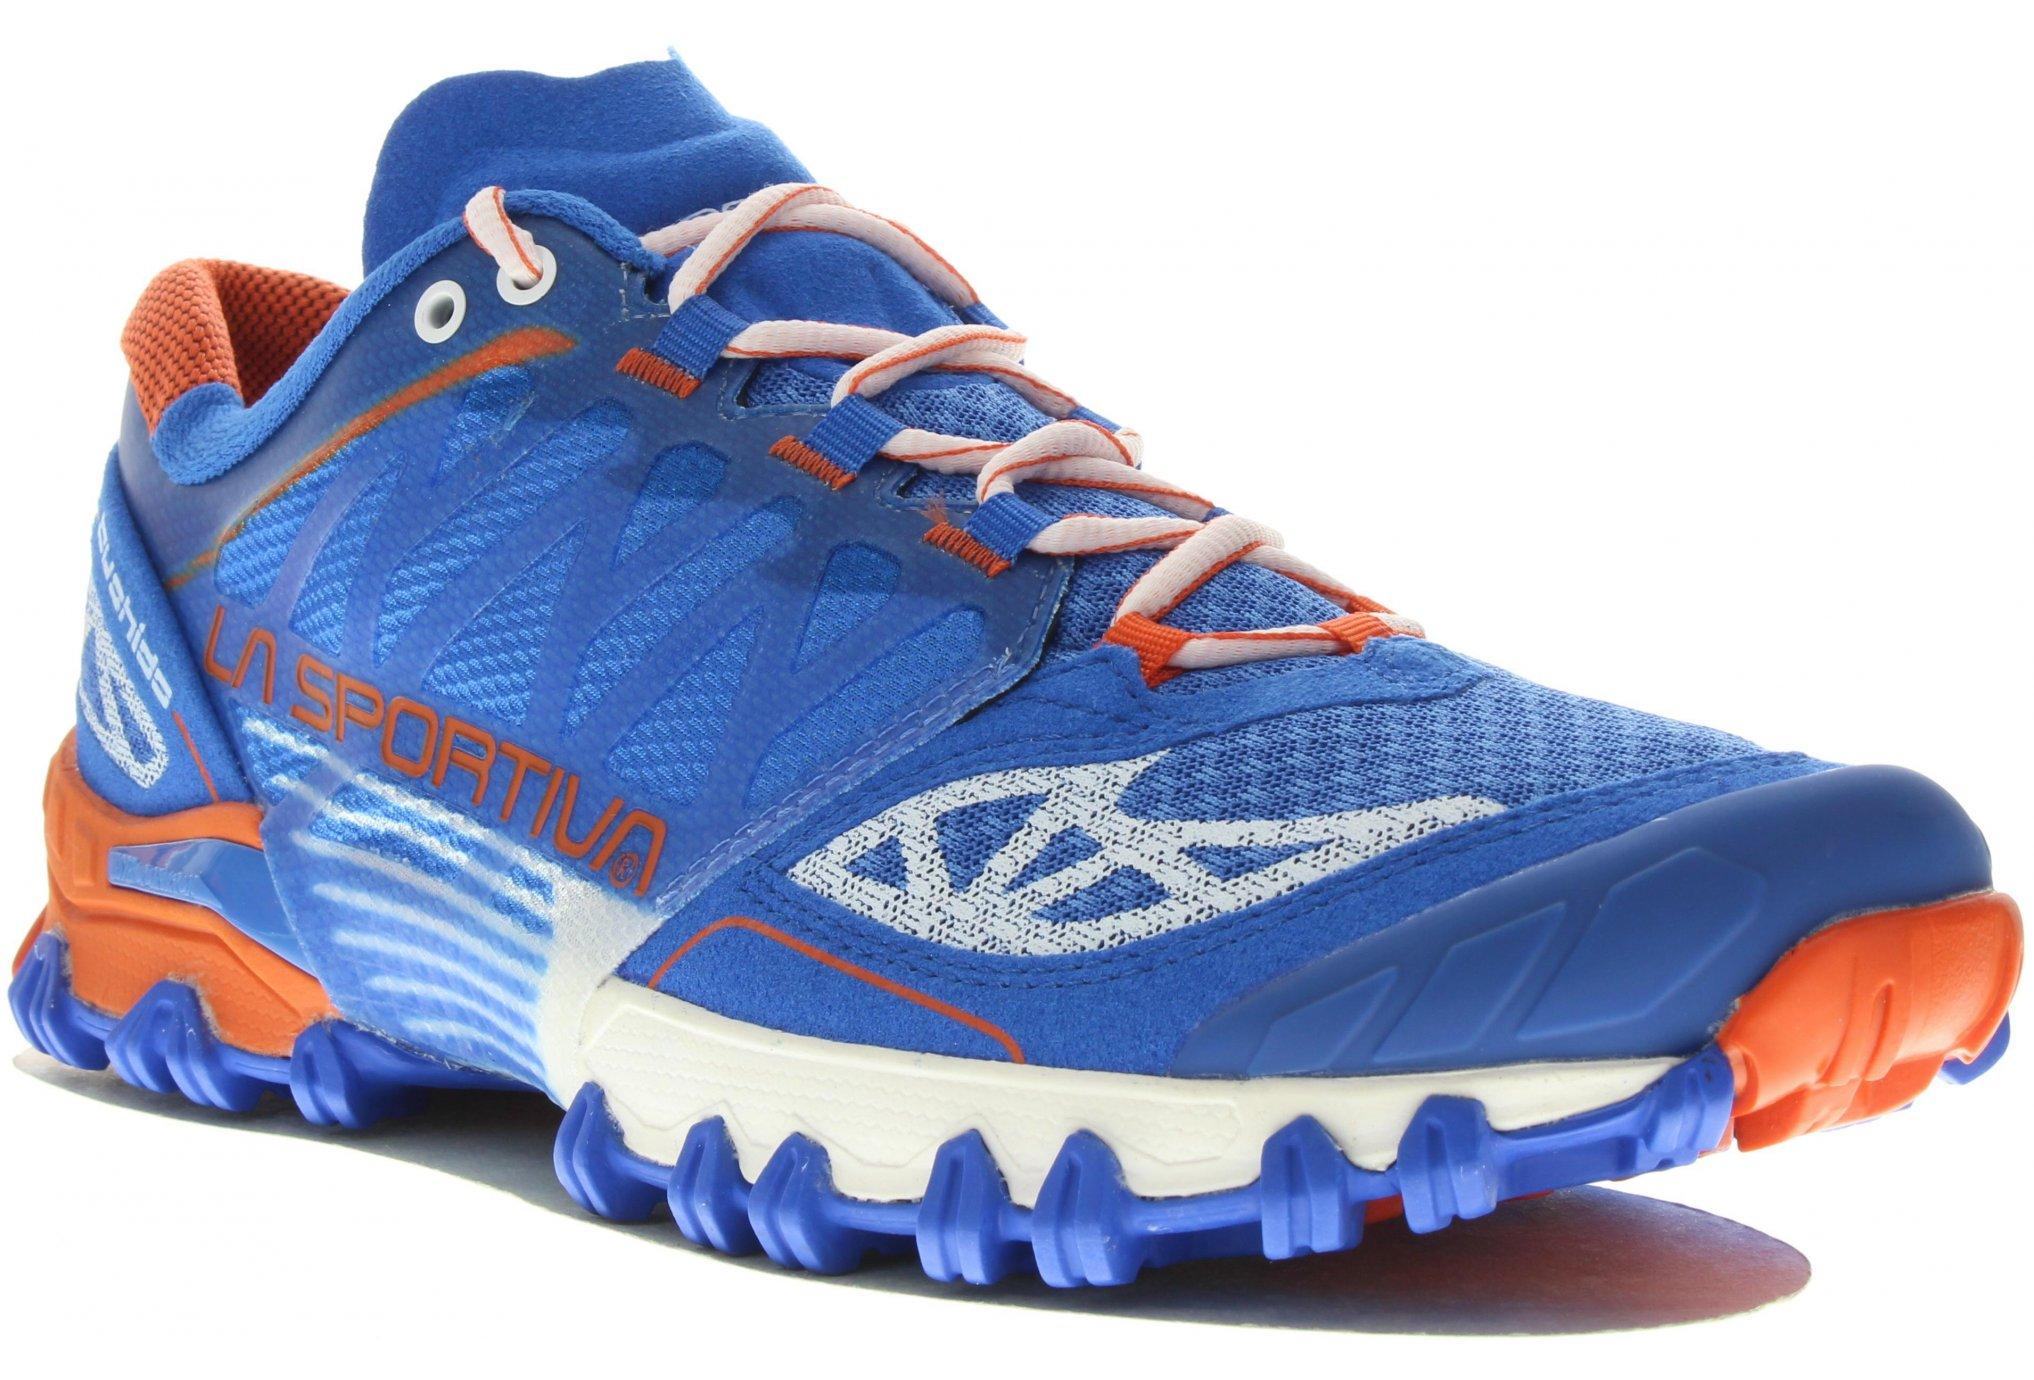 La Sportiva Bushido Women marine blue/lily orange